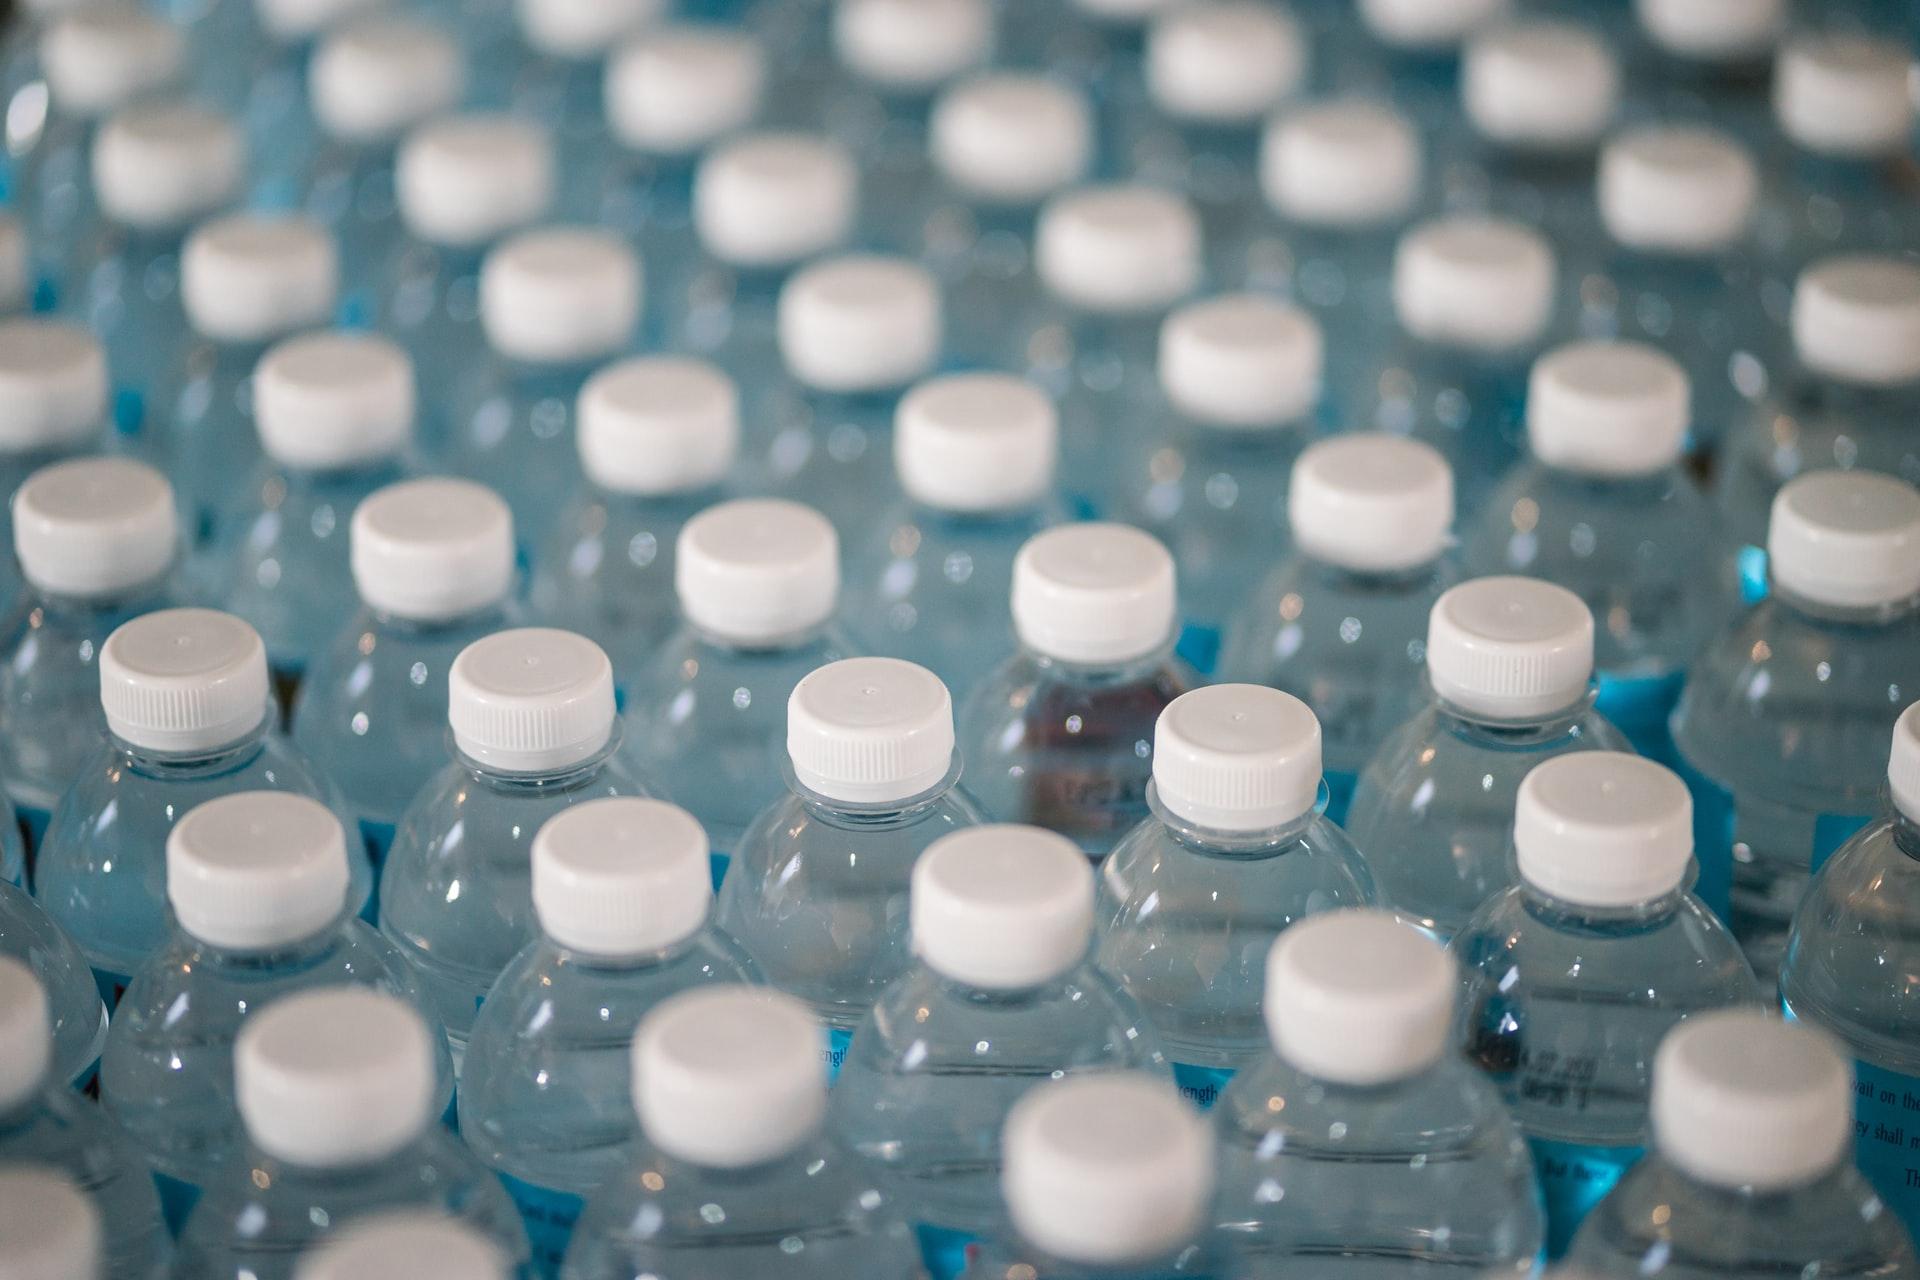 Plastics - bottles - single use - Queensland